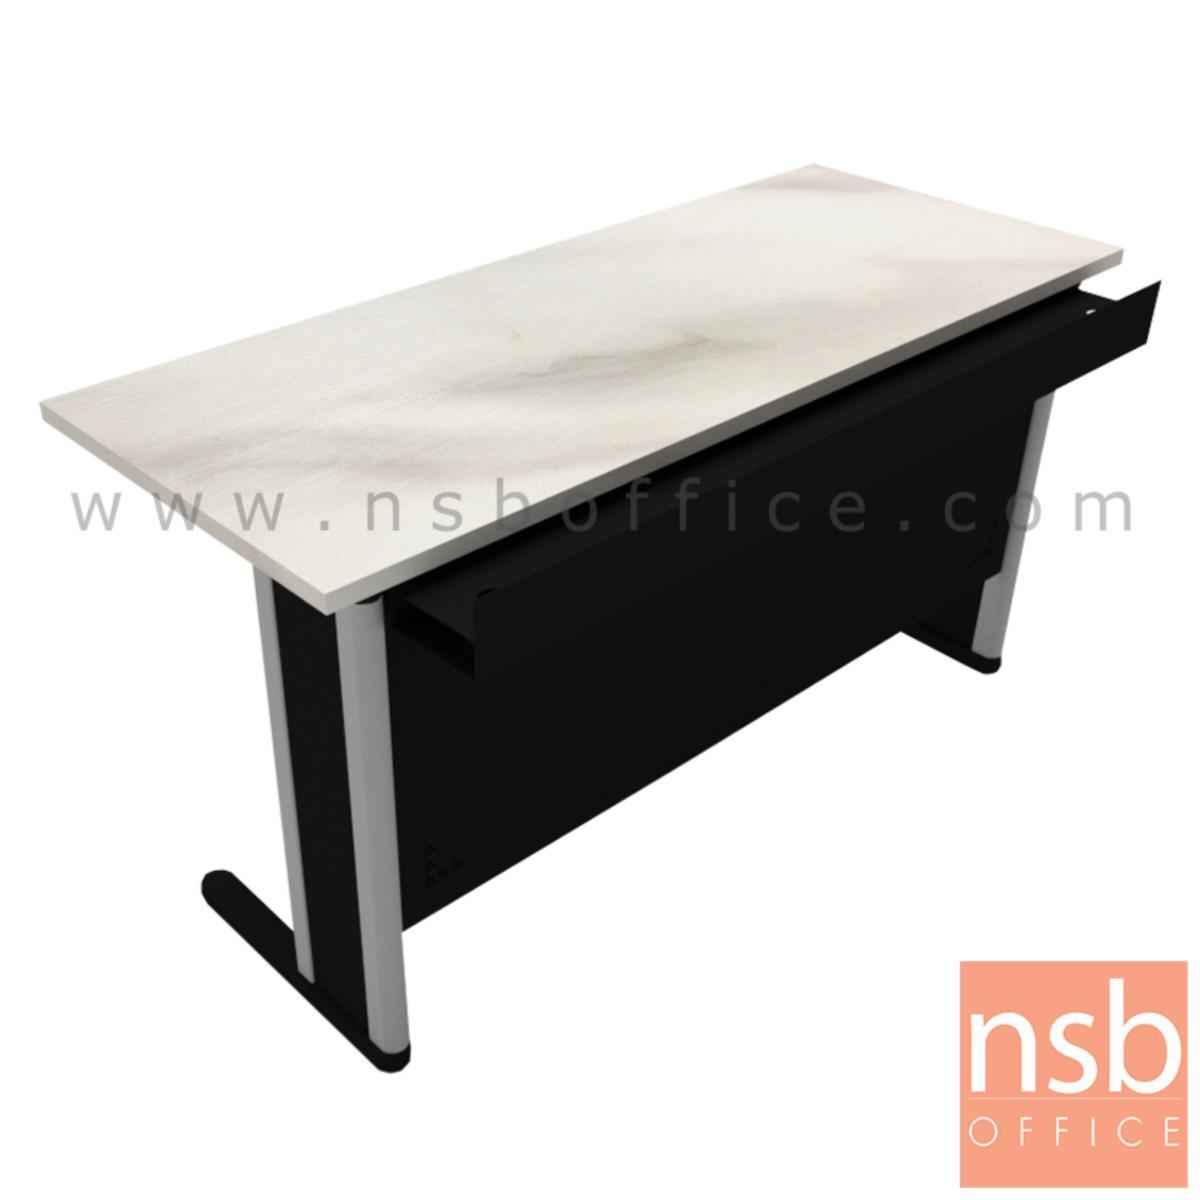 A18A100:โต๊ะประชุมตรง  ขนาด 150W,180W,210W cm. พร้อมบังตาเหล็ก และที่วางจอ